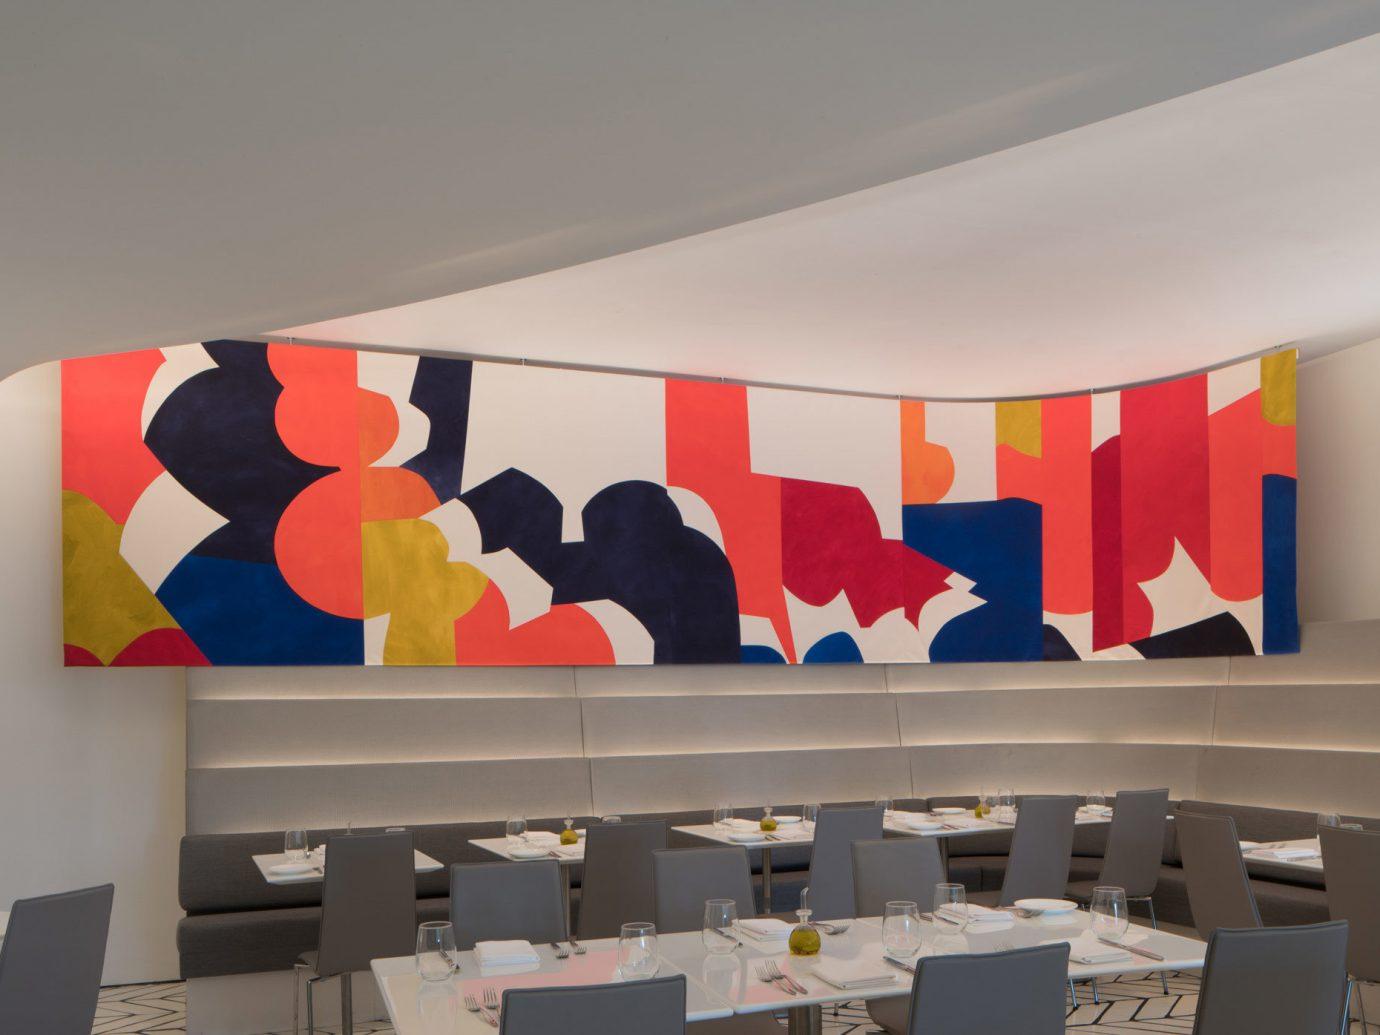 Food + Drink color indoor ceiling Architecture art interior design Design brand modern art shape exhibition display device